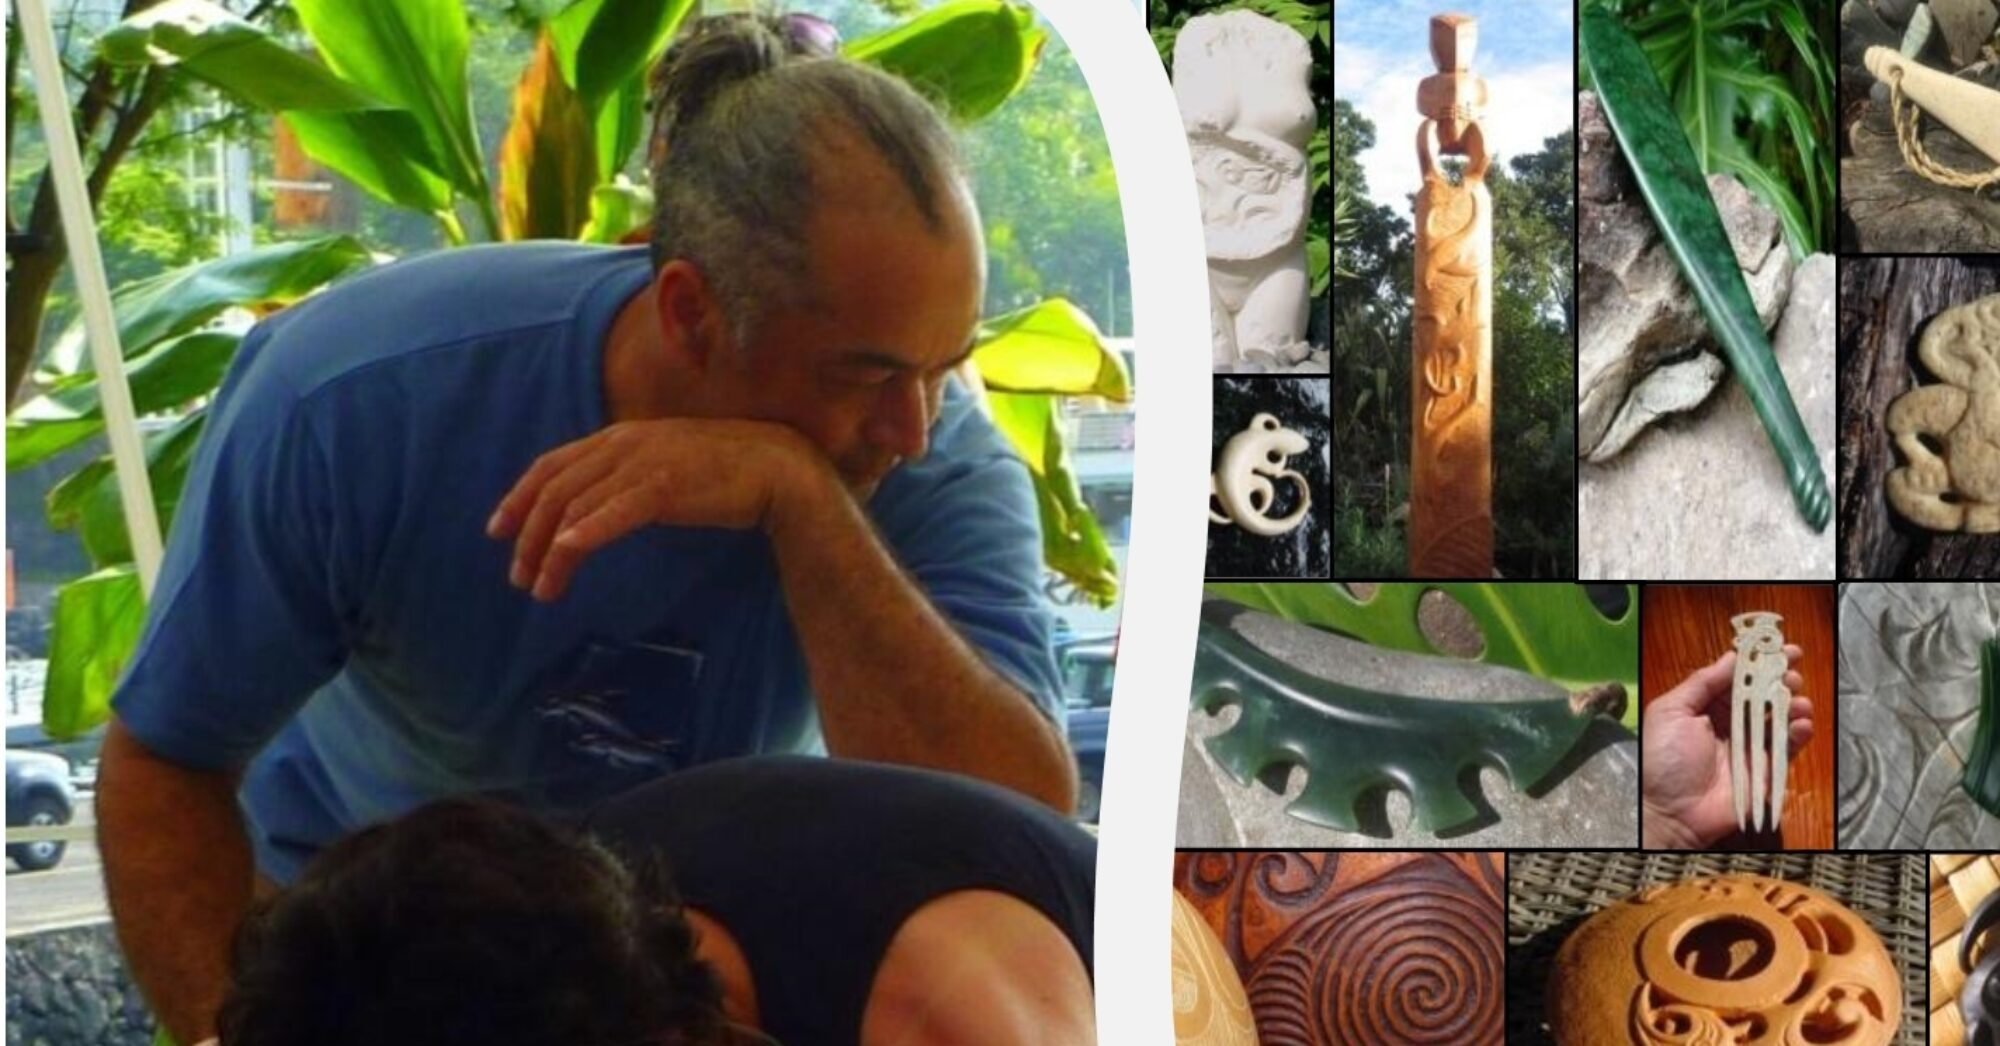 Intuitive Healing Arts